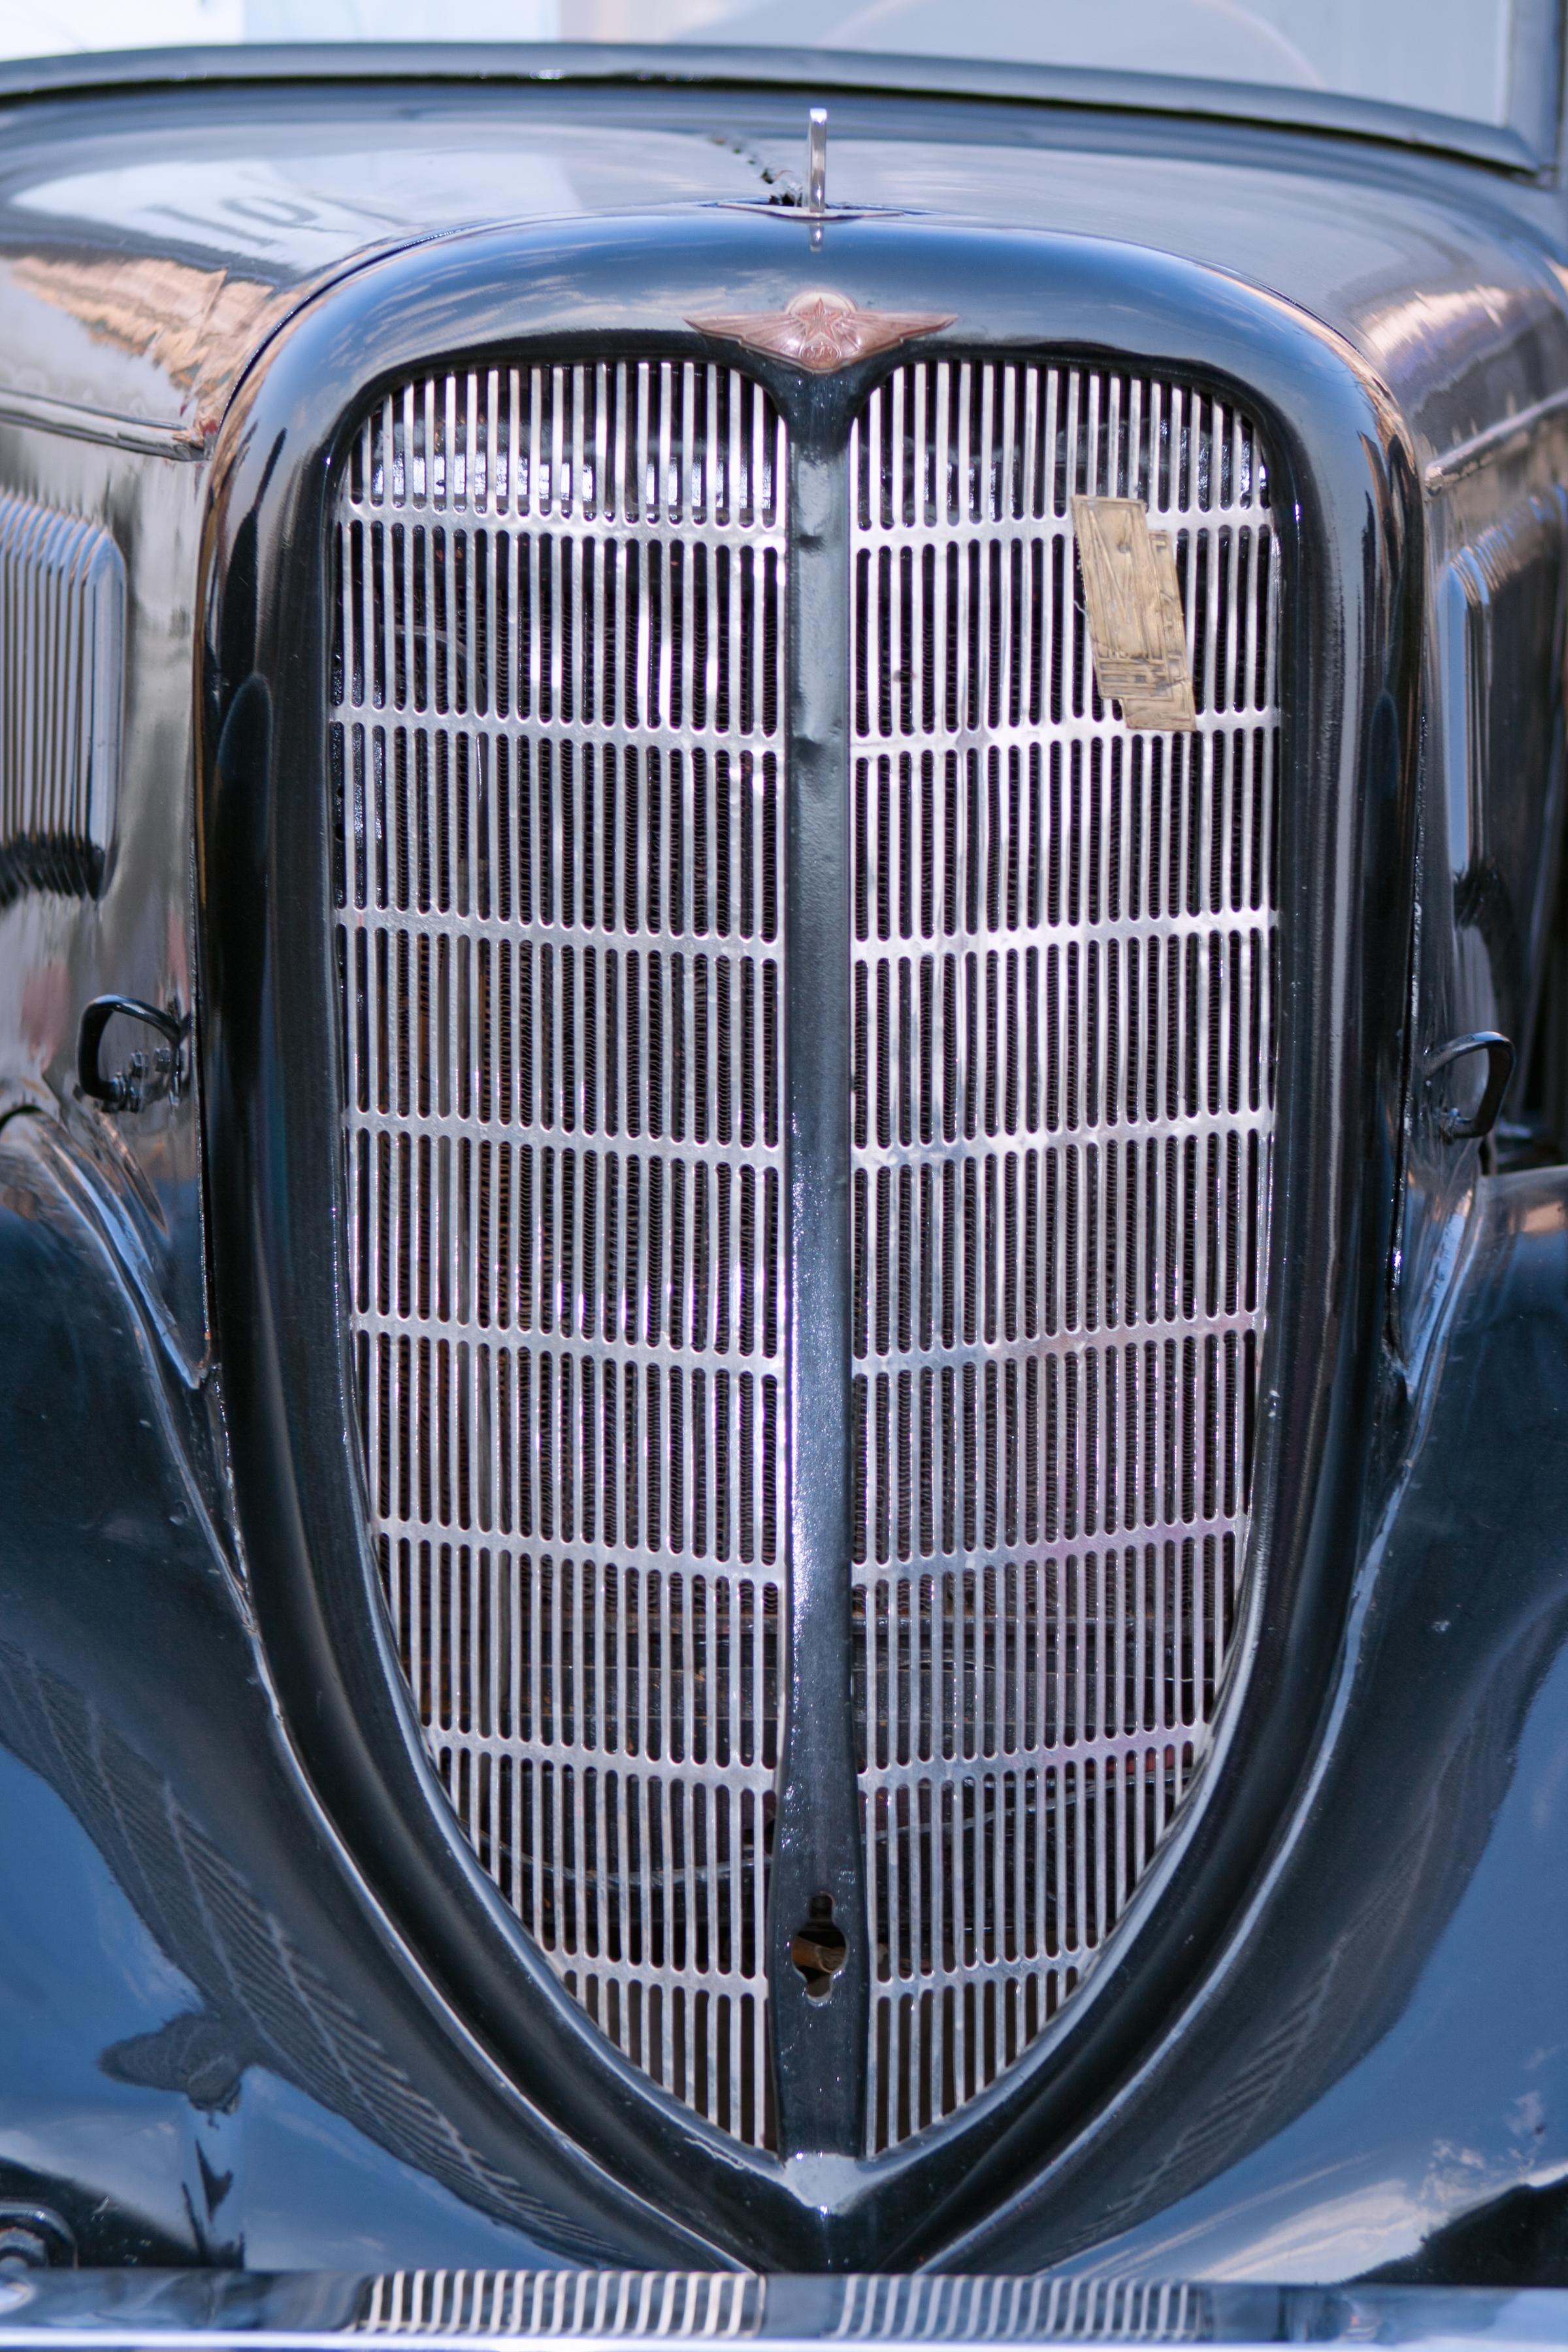 Car Radiator, Automobile, Bars, Black, Car, HQ Photo